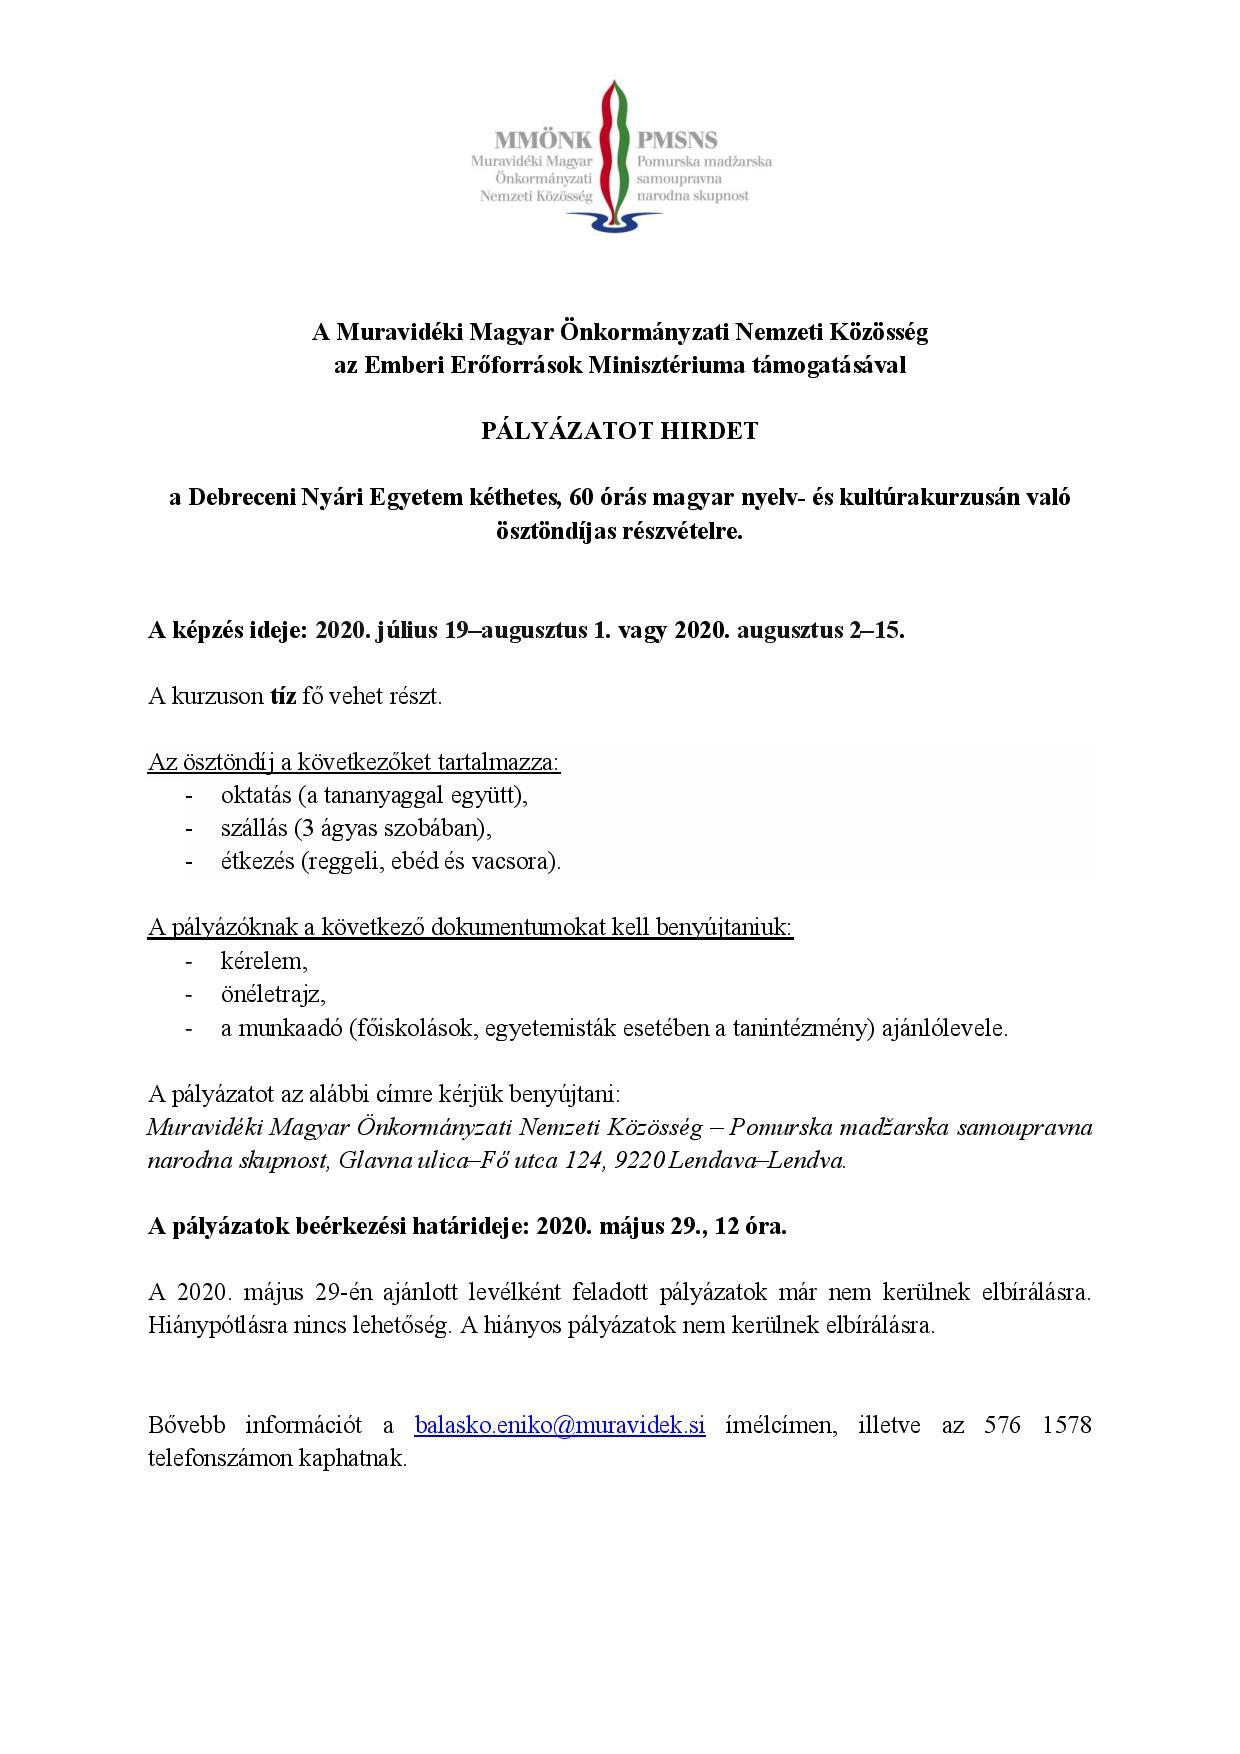 debreceni-nyari-egyetem_2020_palyazat_ketnyelvu_hu-page-001